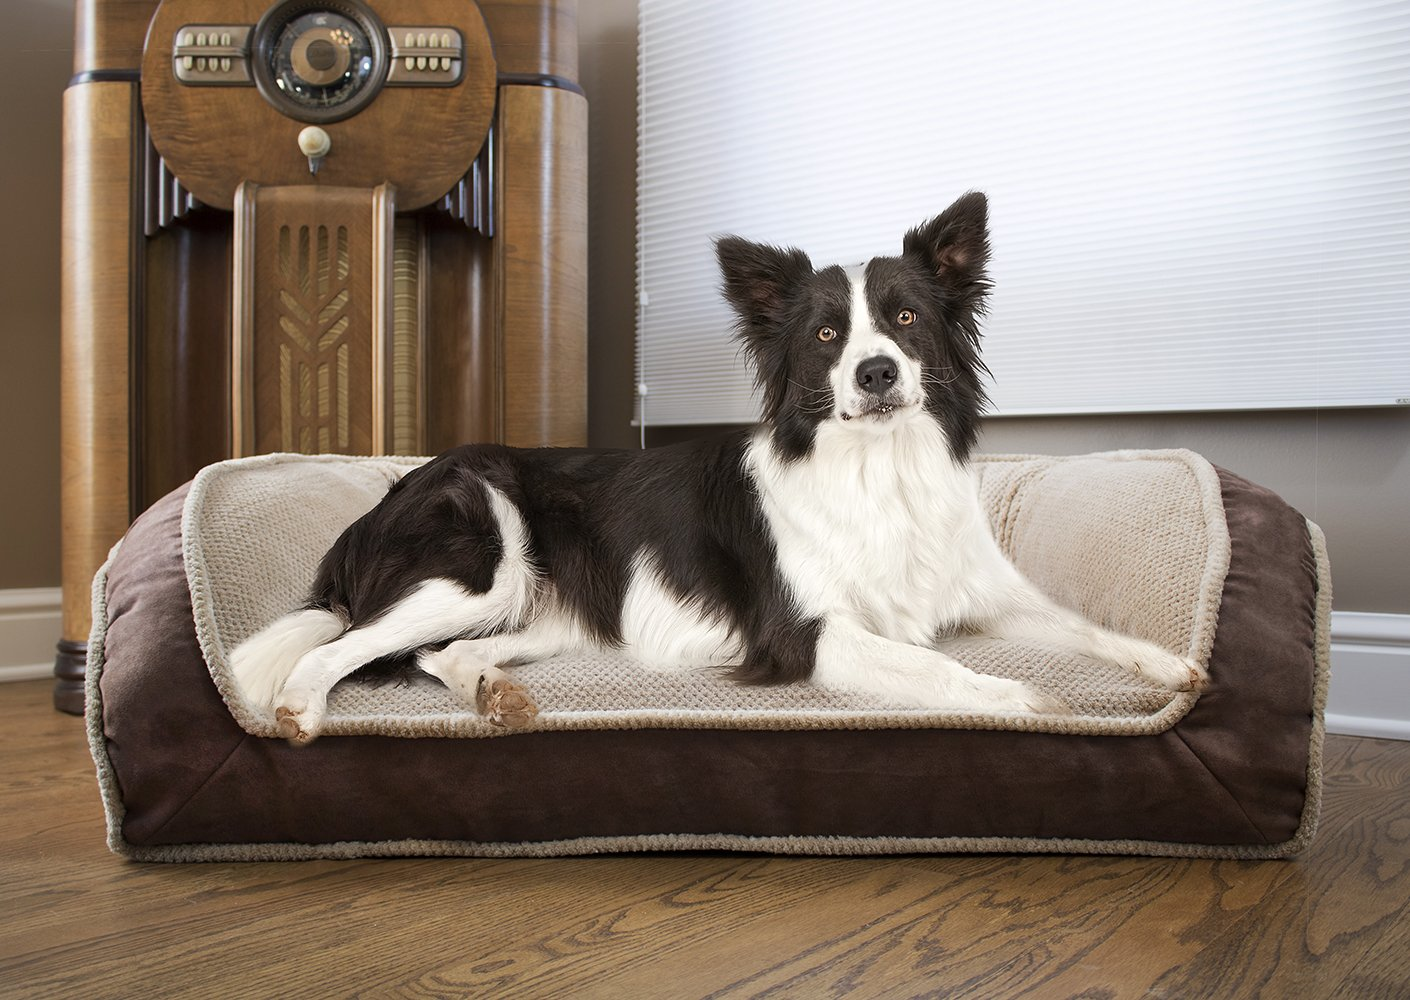 Arlee 59-01000DRF Deep Seated Lounger Sofa Pet Bed, Small/Medium, Driftwood Tan by Arlee